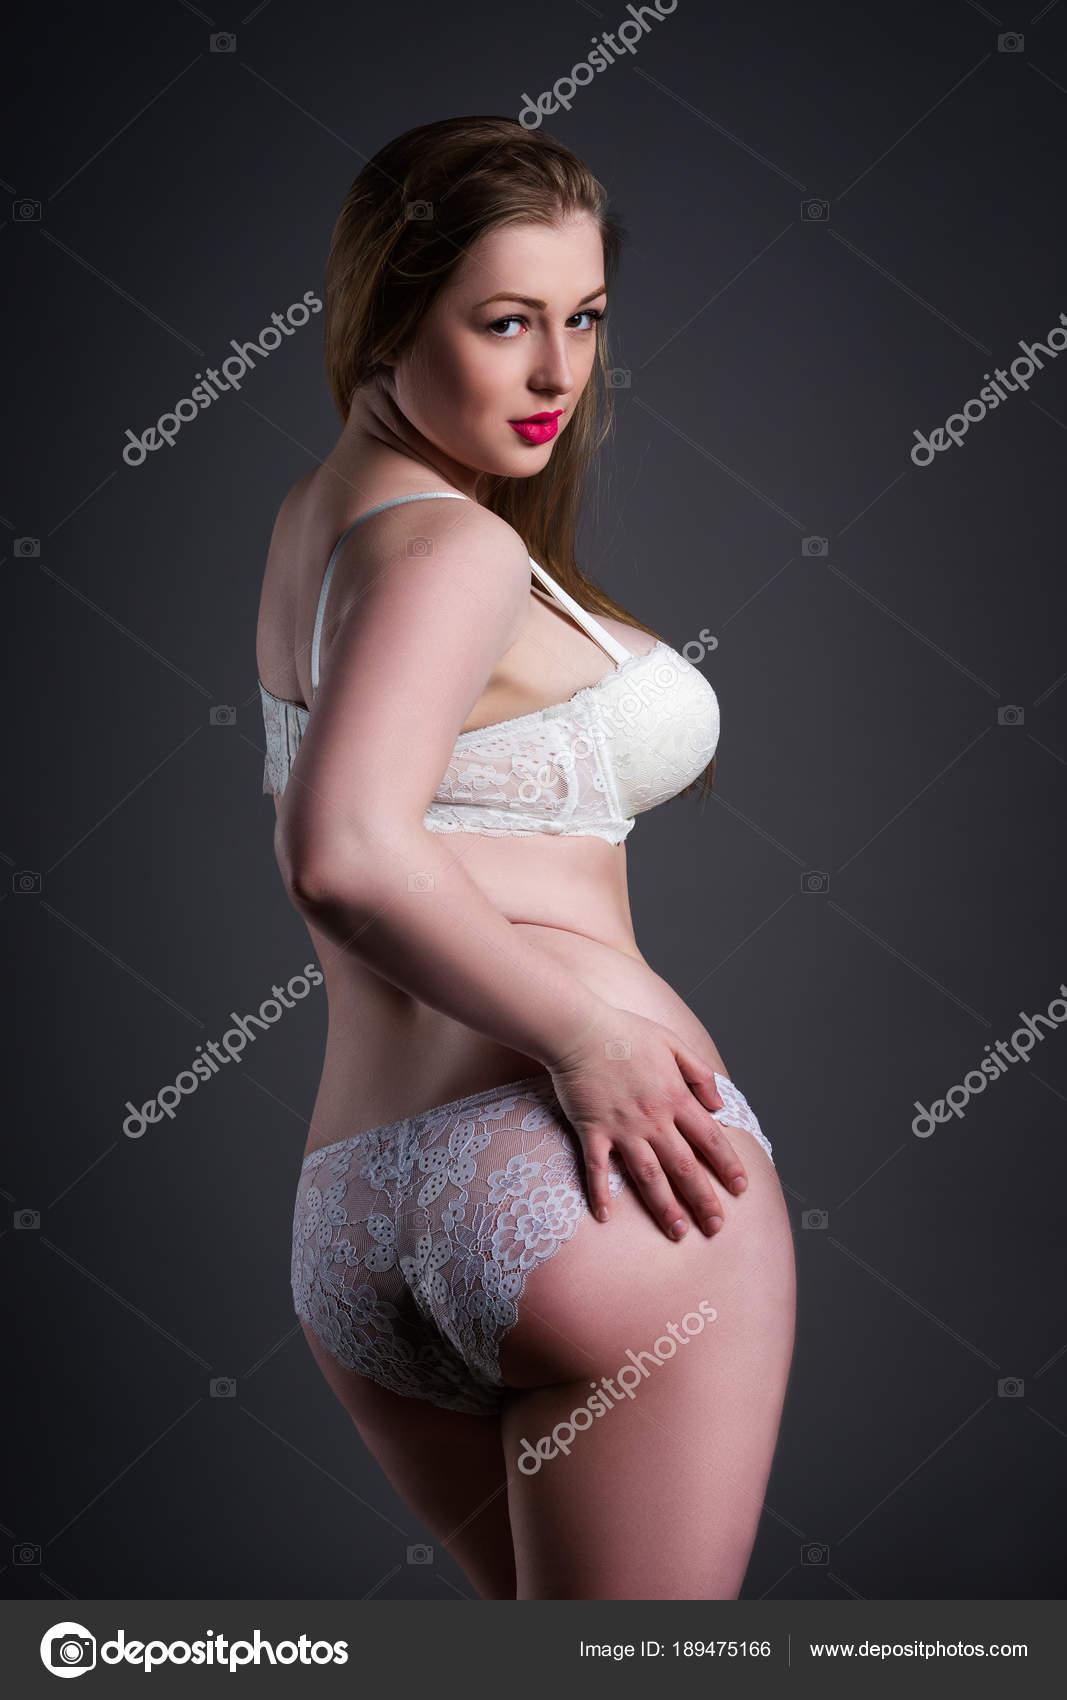 Bugil hot lesbian lesbian sexy